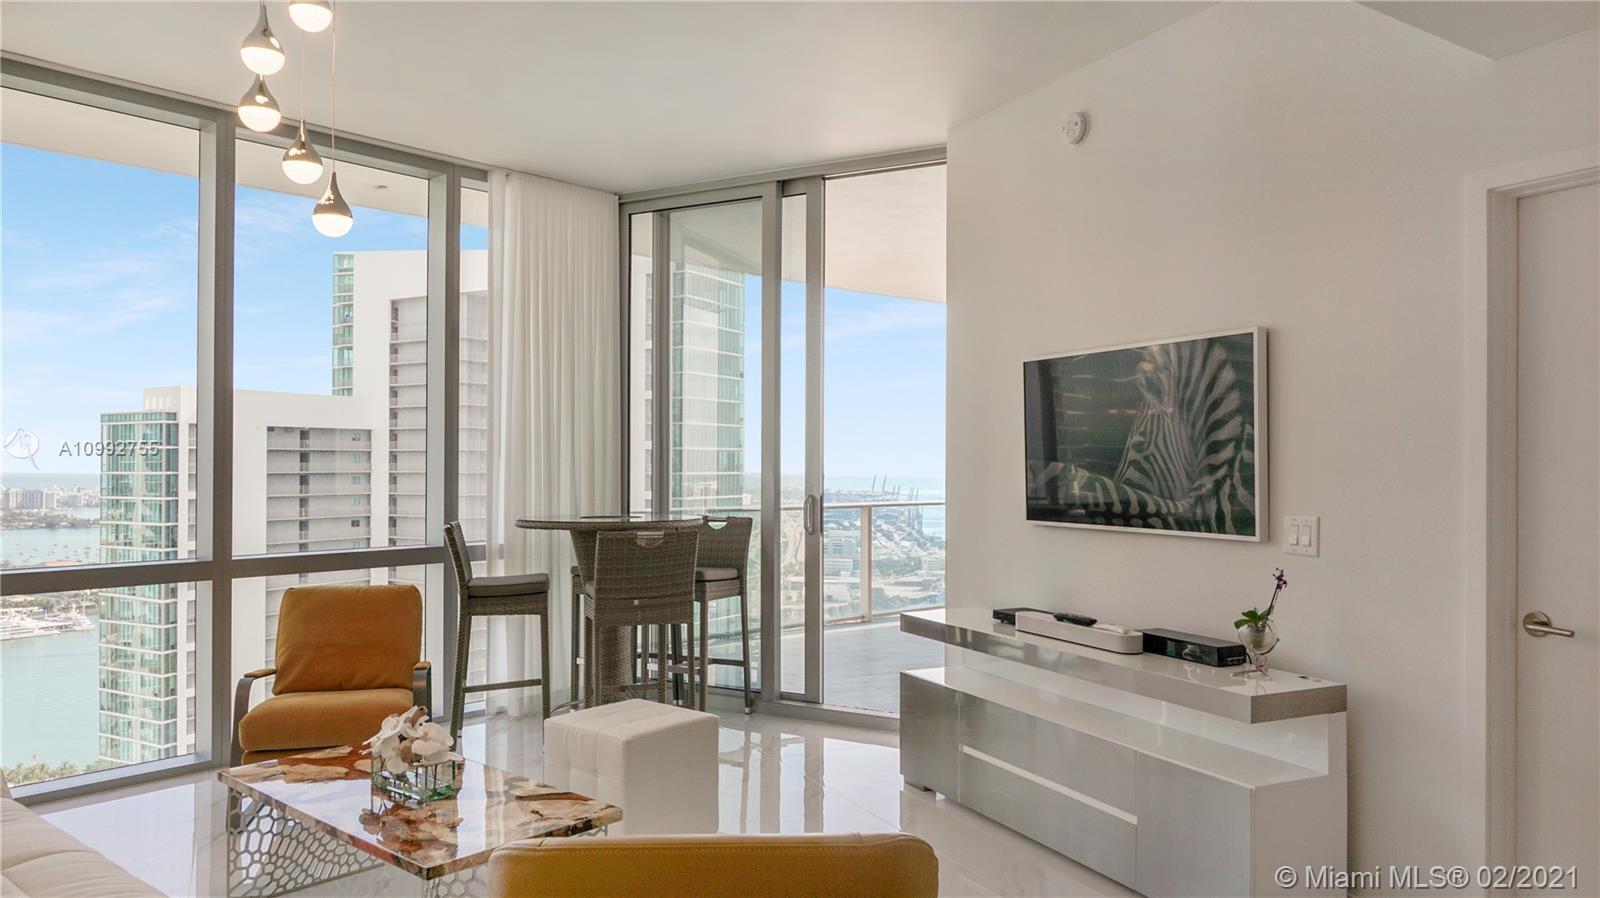 Paramount Miami Worldcenter #4503 - 851 NE 1st Ave #4503, Miami, FL 33132